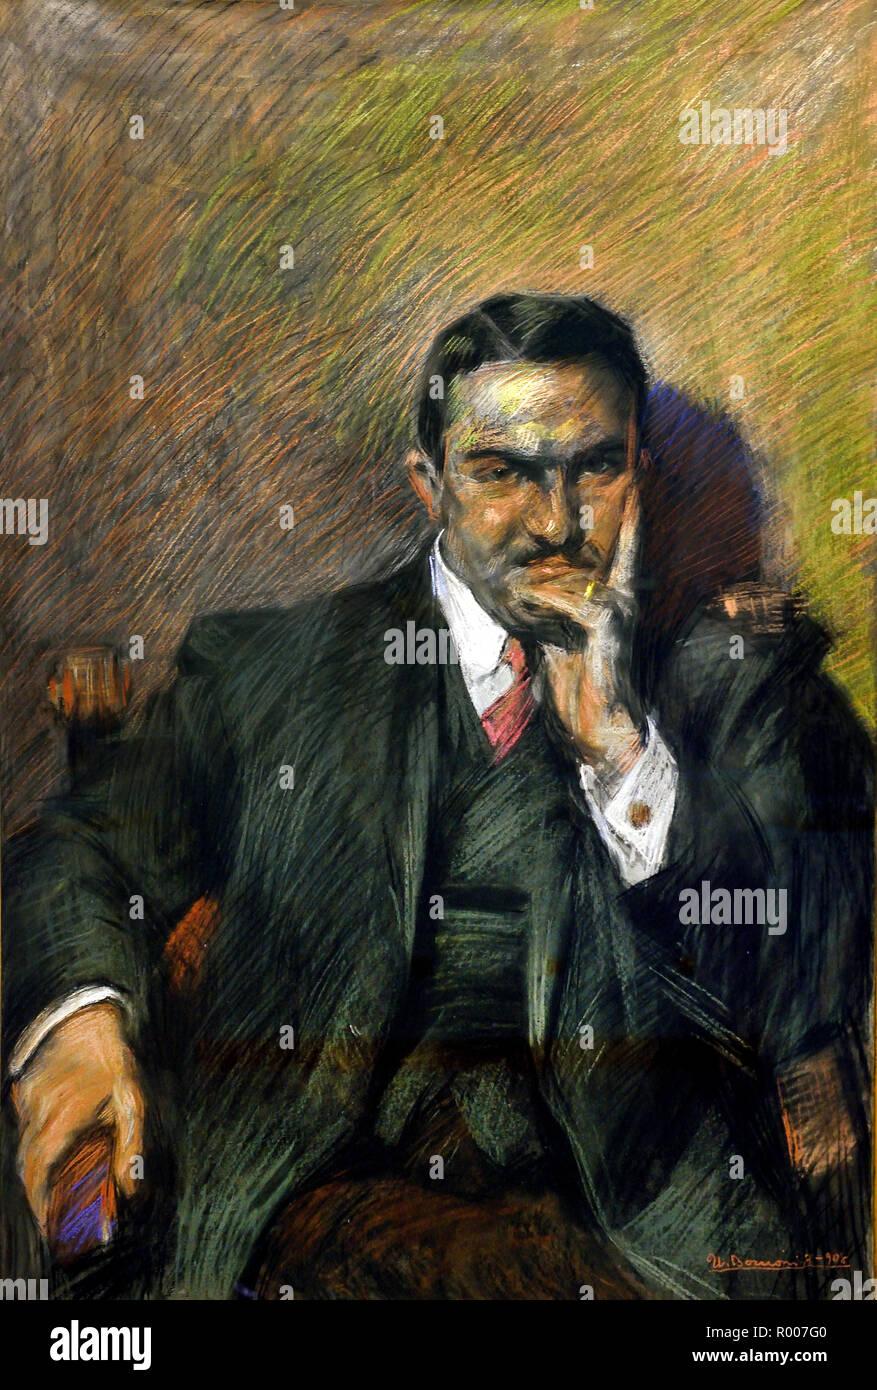 Portrait of Innocenzo Massimino 1908 Umberto Boccioni (1882-1916), Italy, Italian. - Stock Image